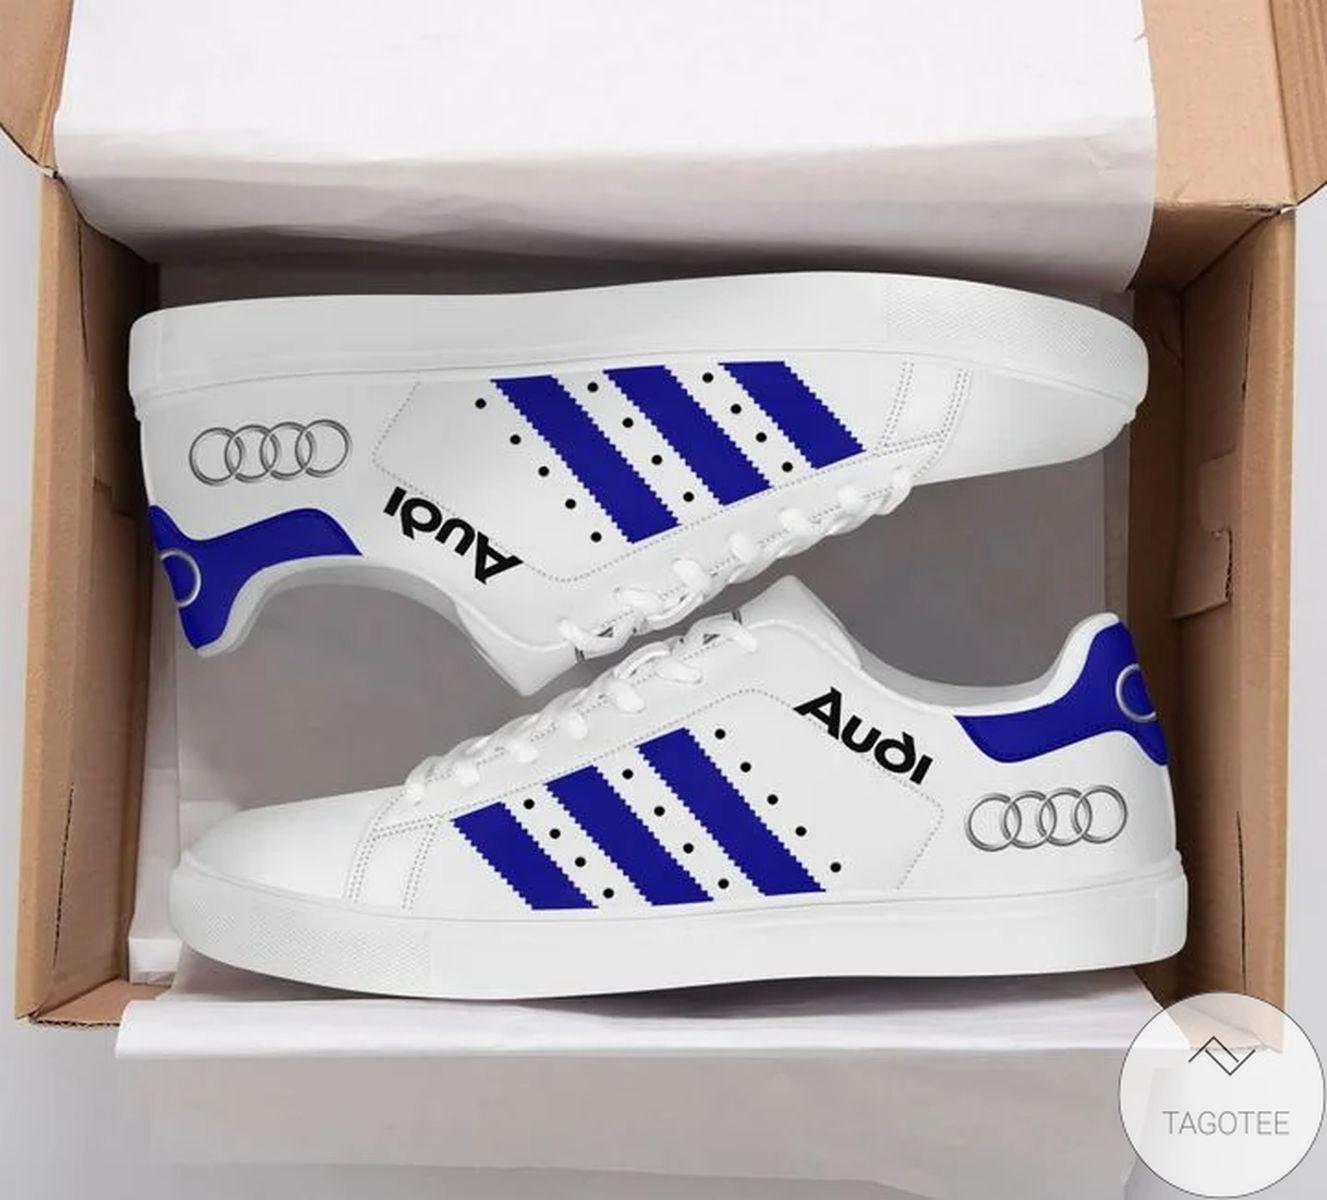 Hot Audi Tt Stan Smith Shoes